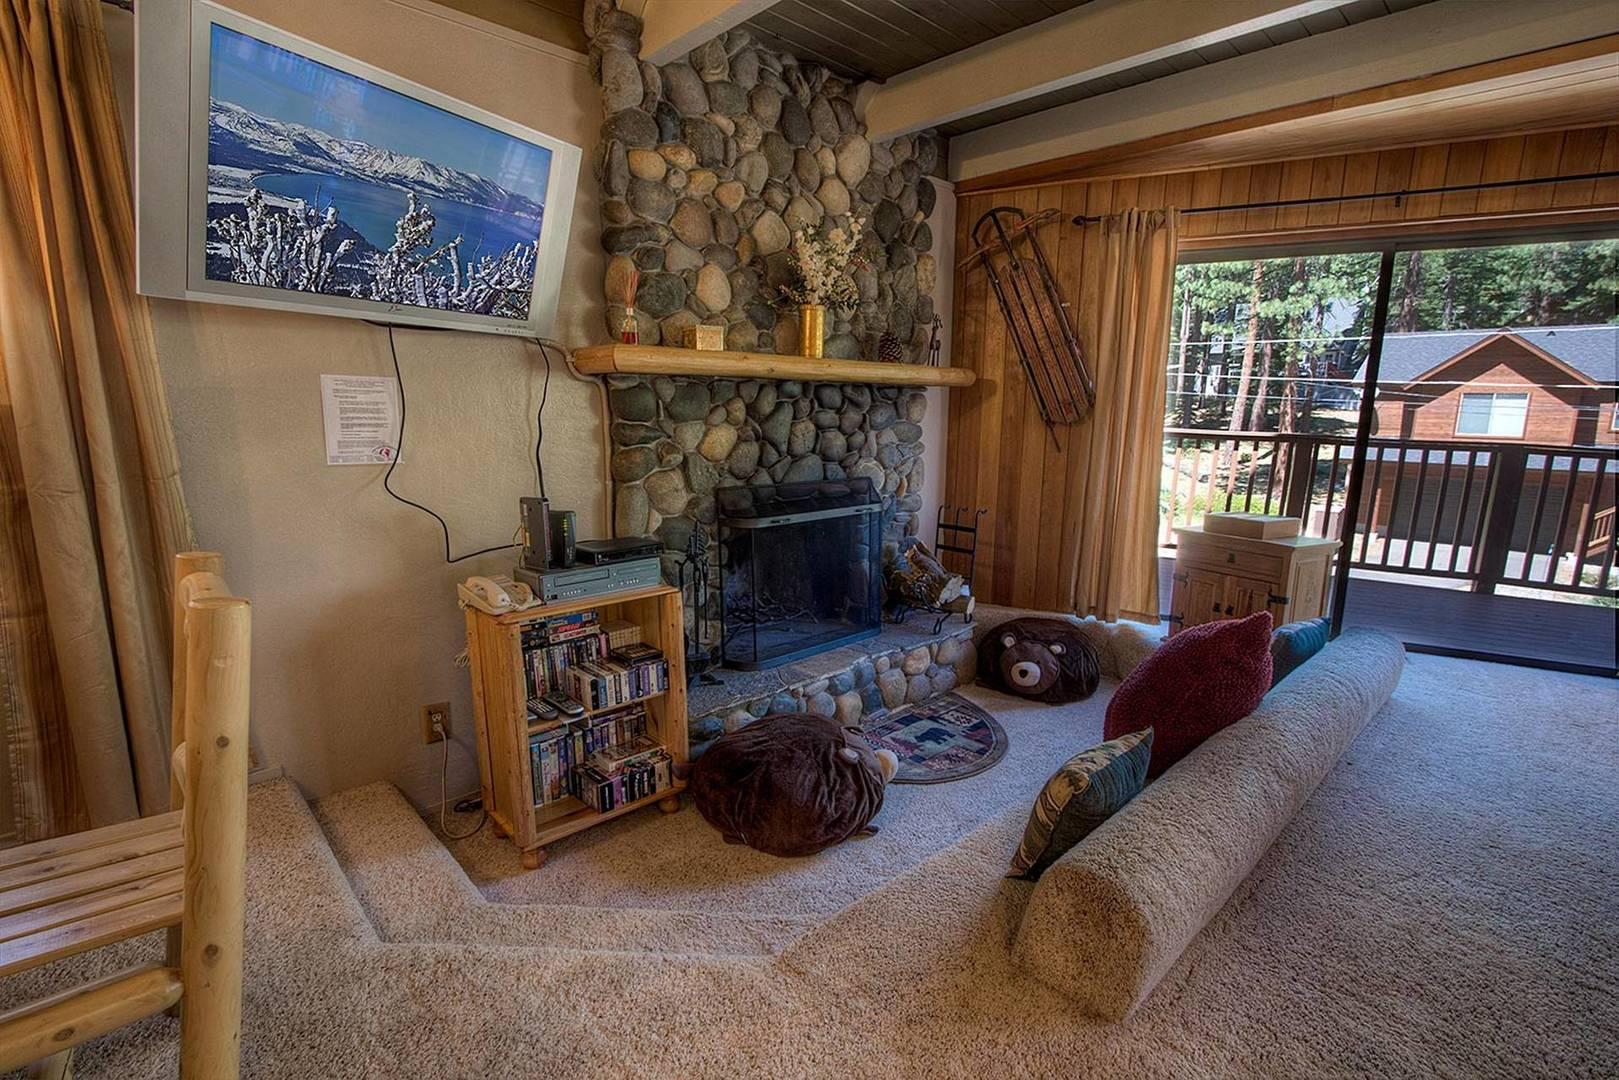 COH1292 Fireplace